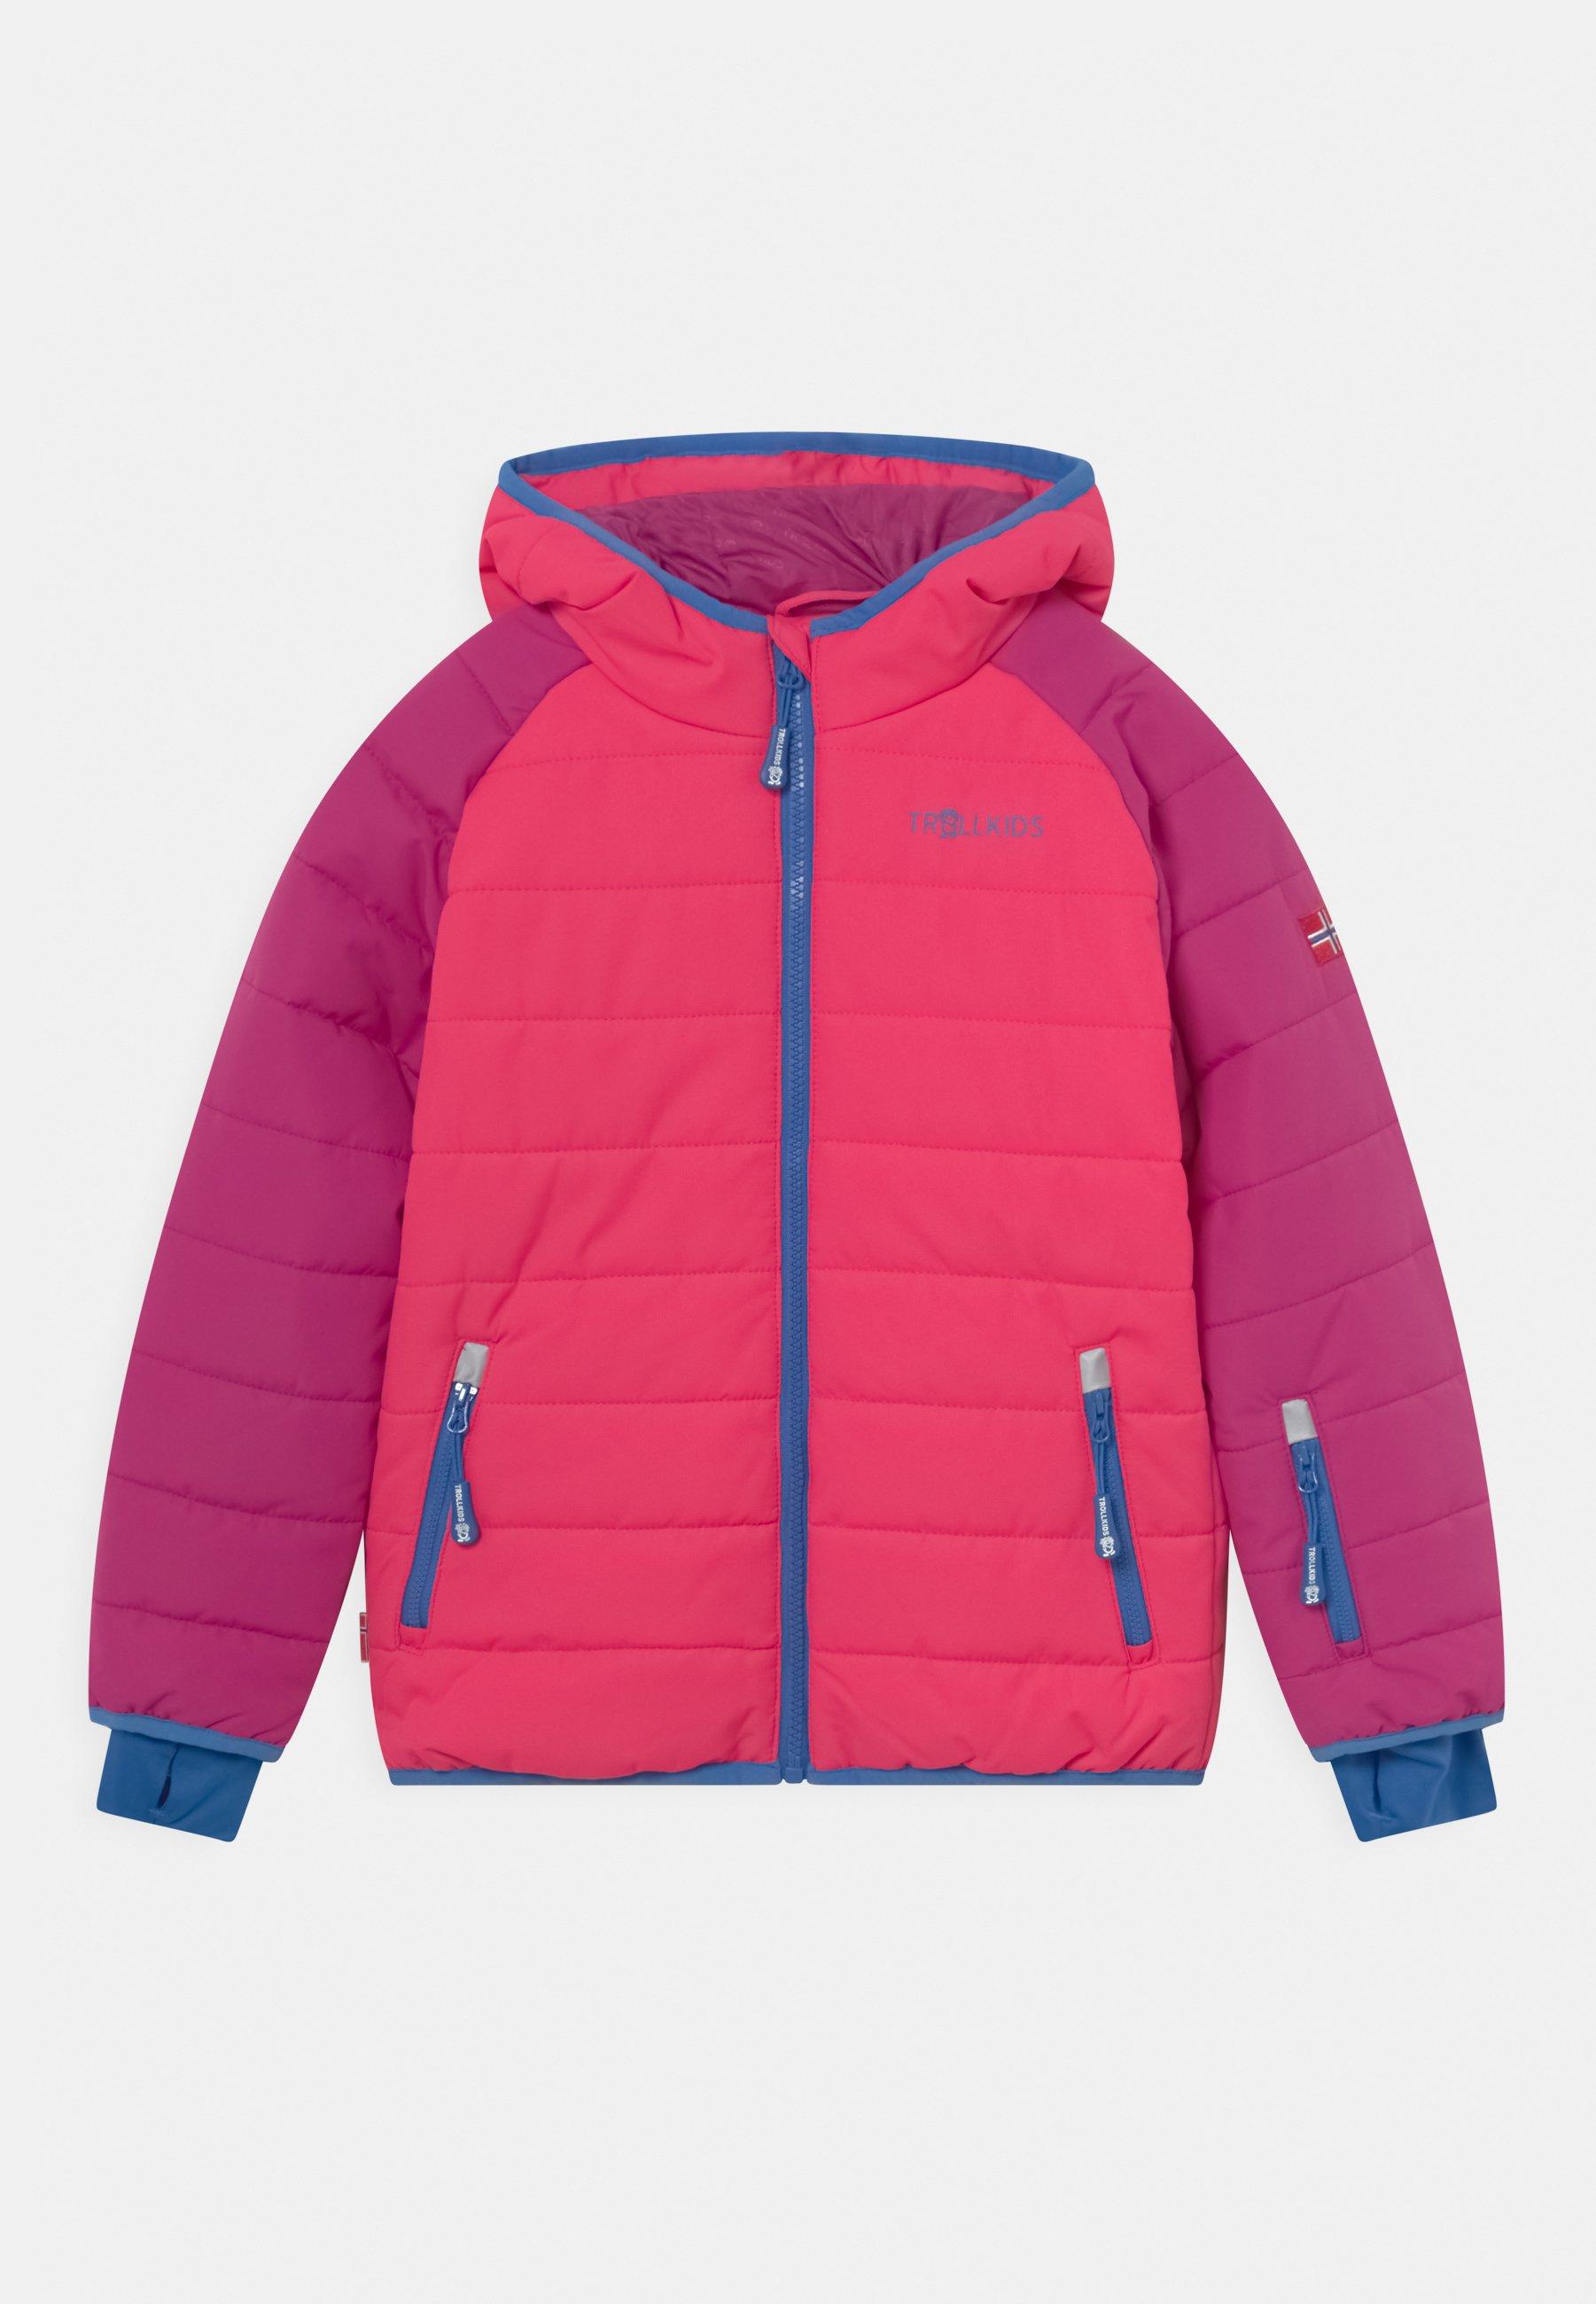 Enfant HAFJELL SNOW JACKET PRO UNISEX - Veste de ski